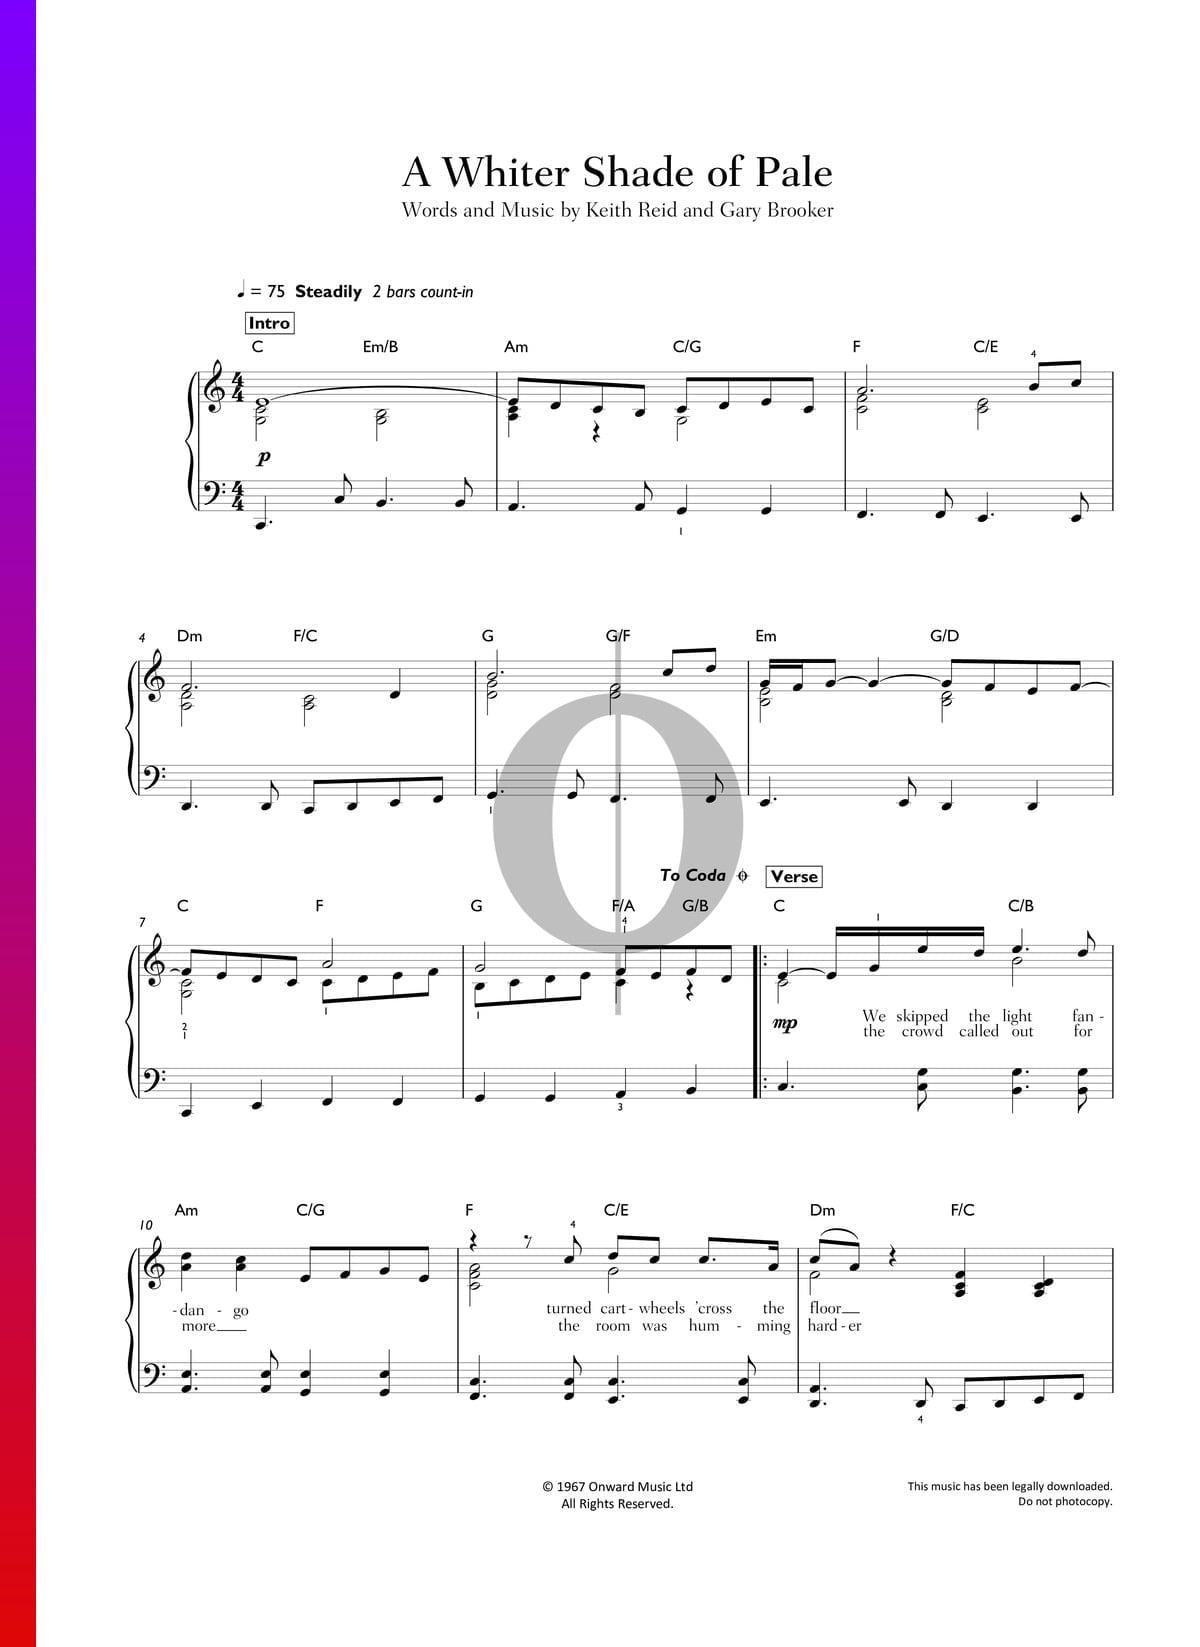 A Whiter Shade Of Pale Piano Sheet Music Pdf   Best Music Sheet